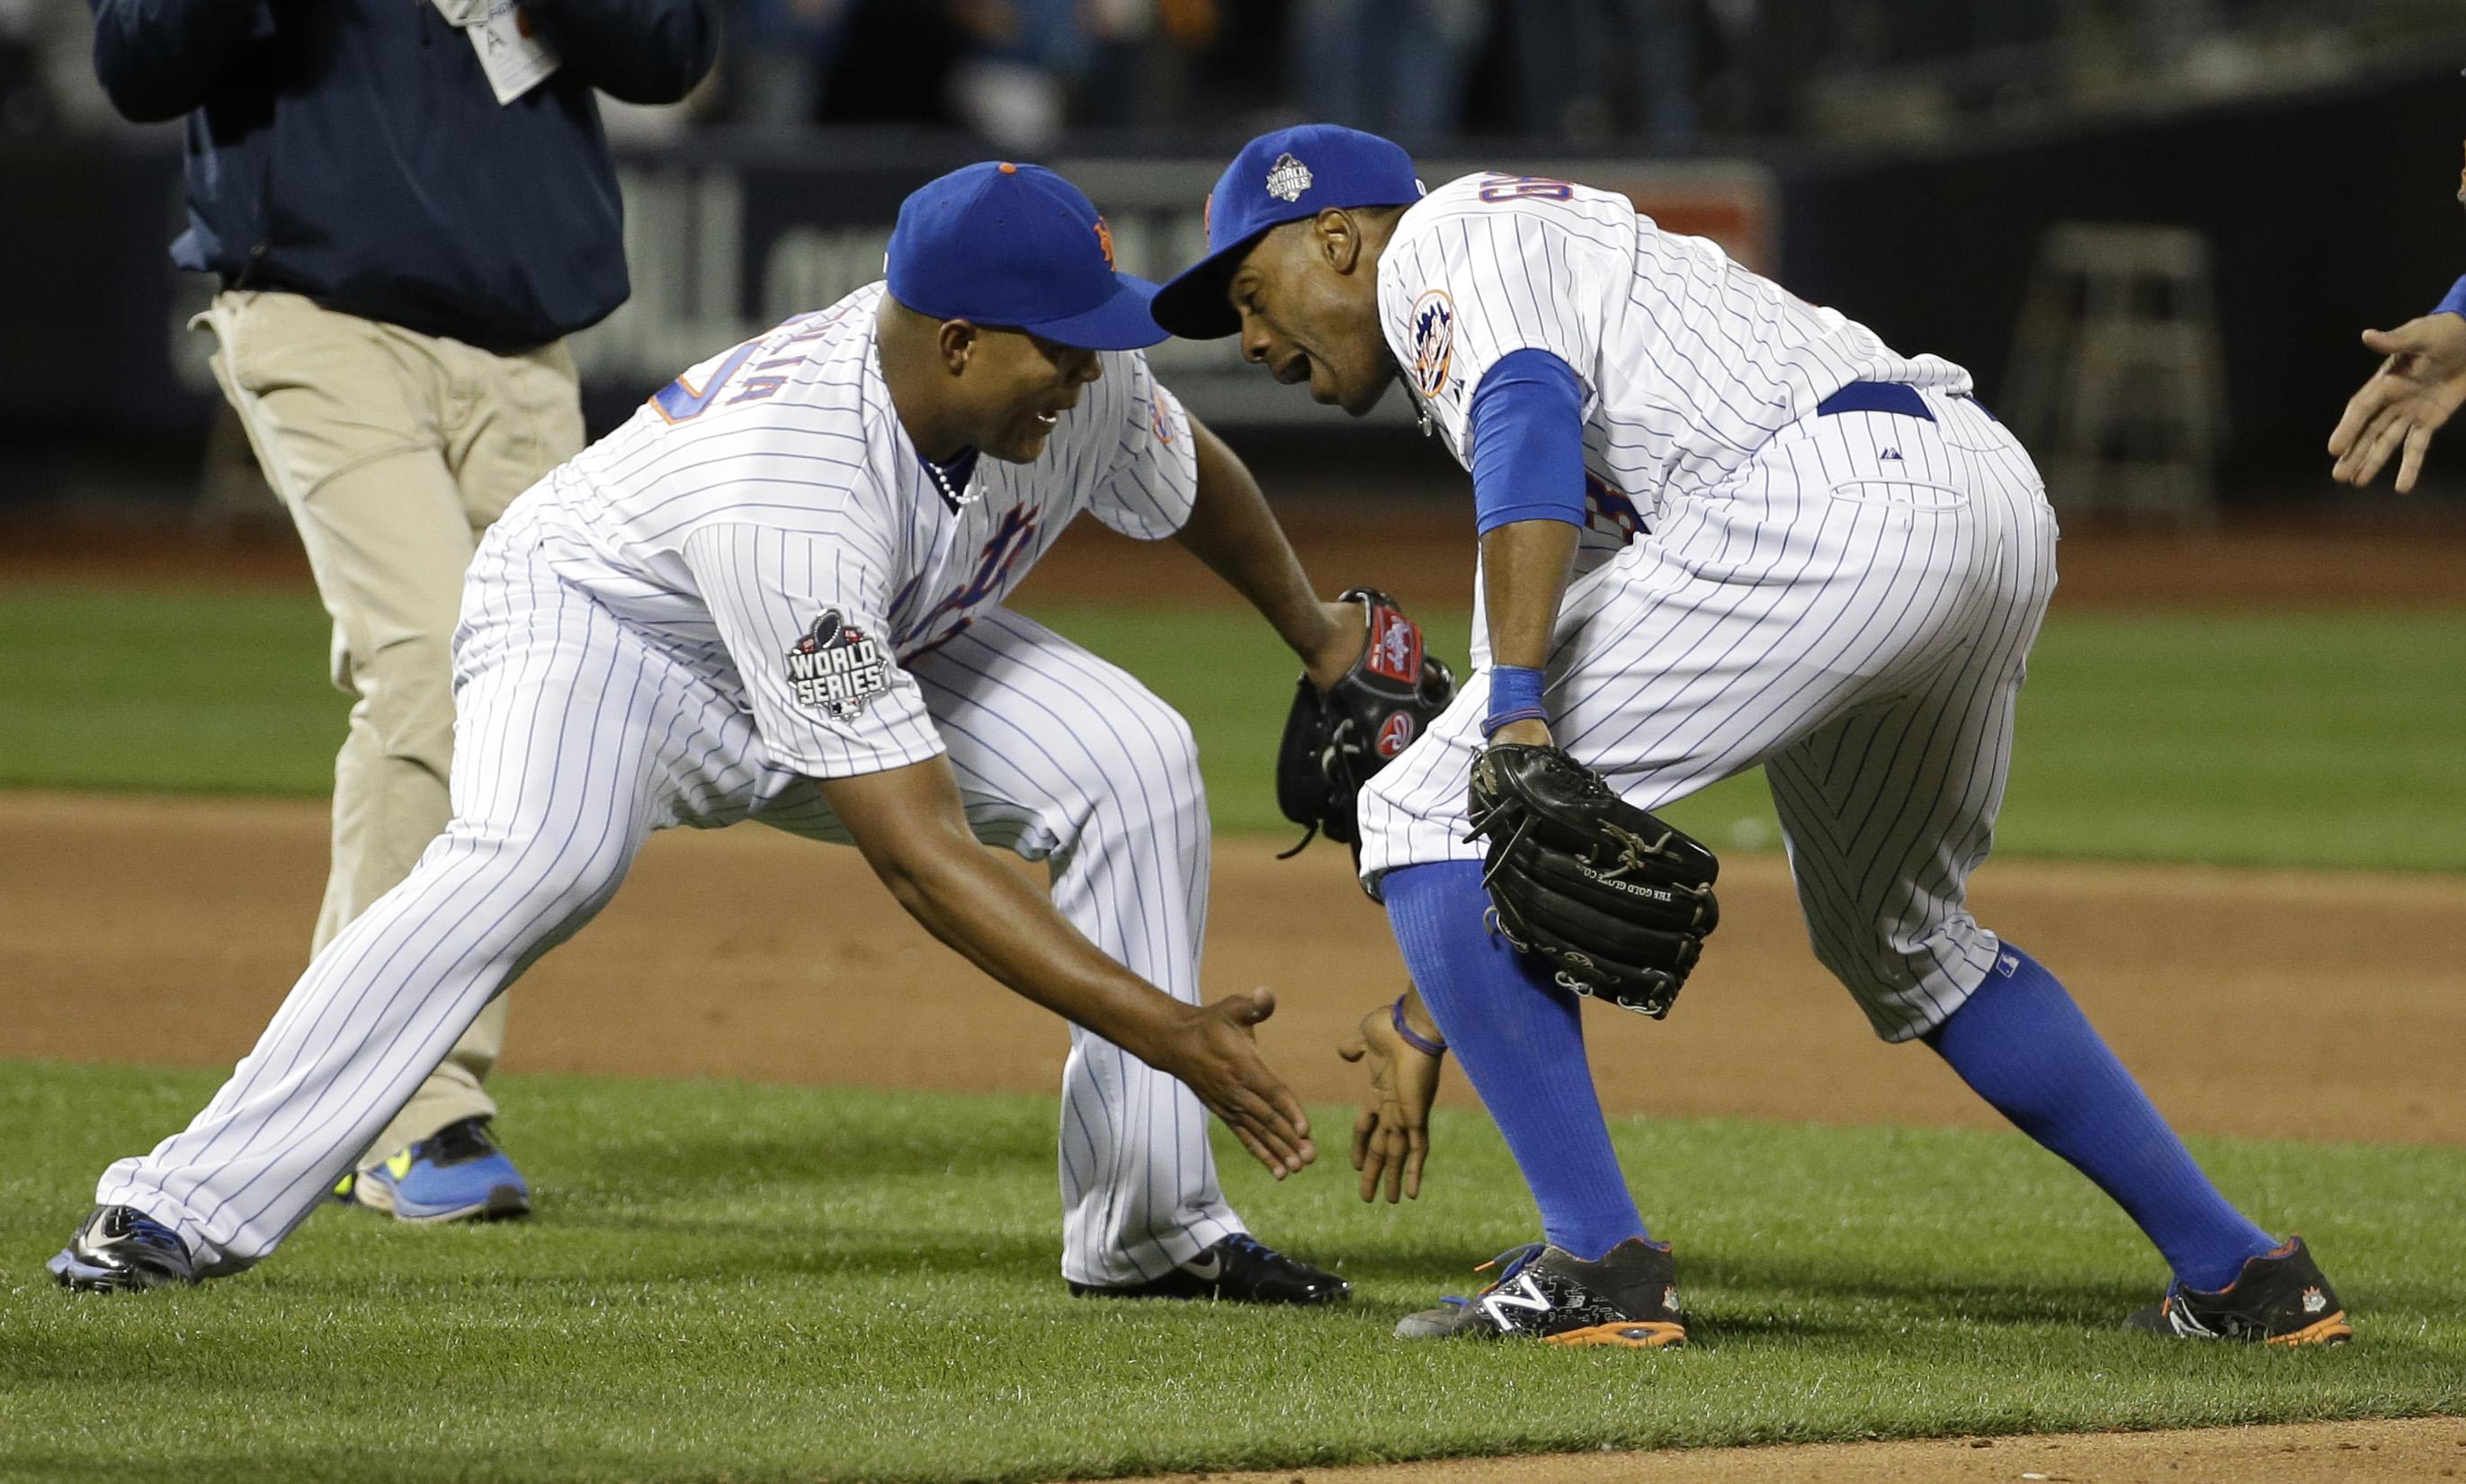 New York Mets beat Kansas City 9-3 in Game 3 of World Series